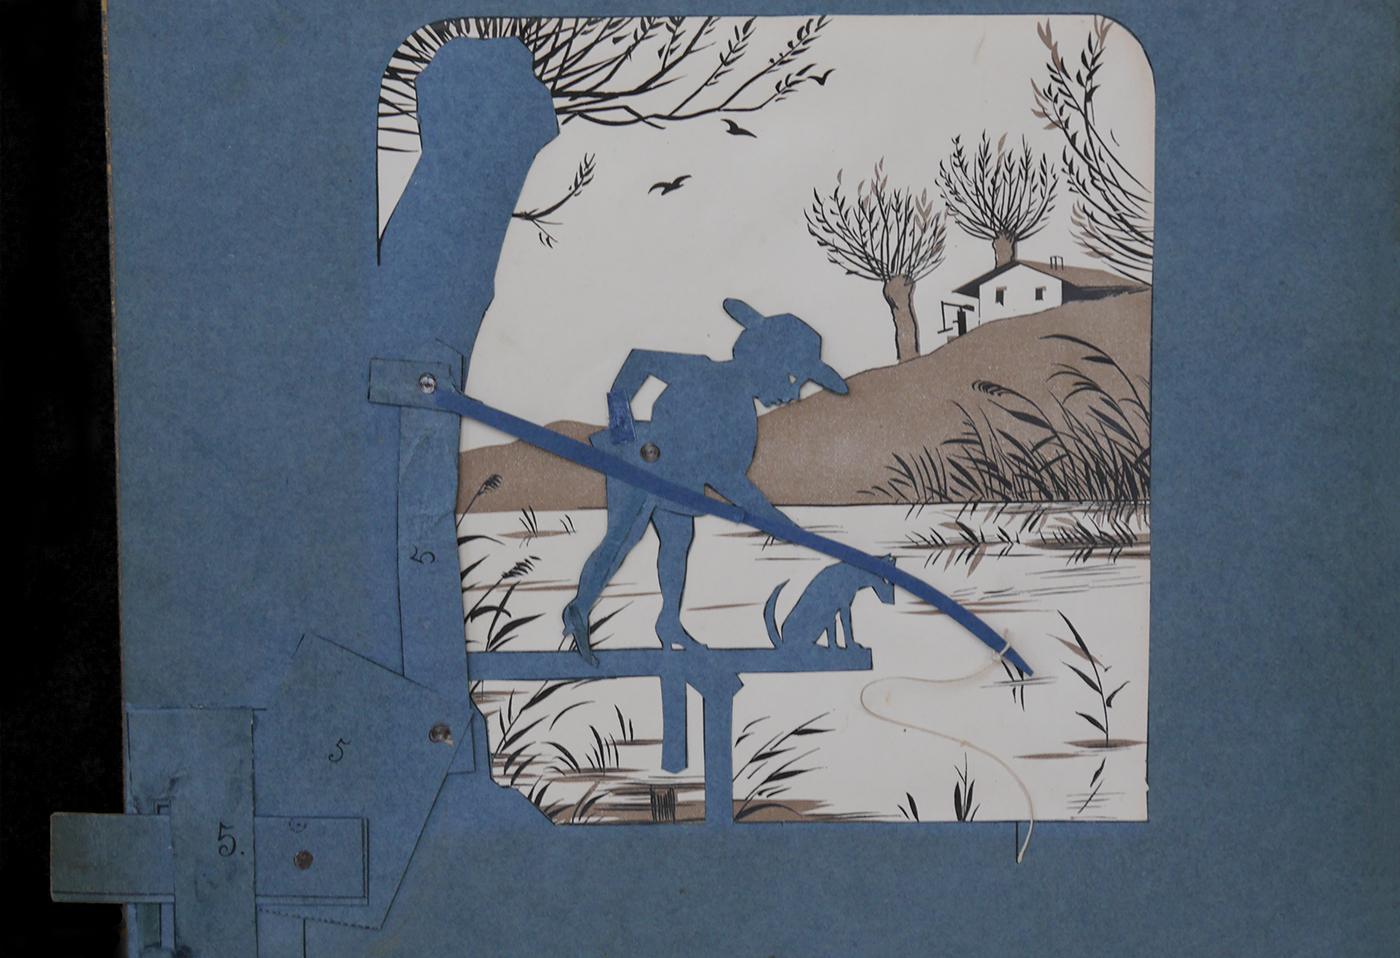 Dem Angler zugrunde liegende Papiermechanik. Aus: Meggendorfer's bewegliche Schattenbilder, 1886. SBB-PK